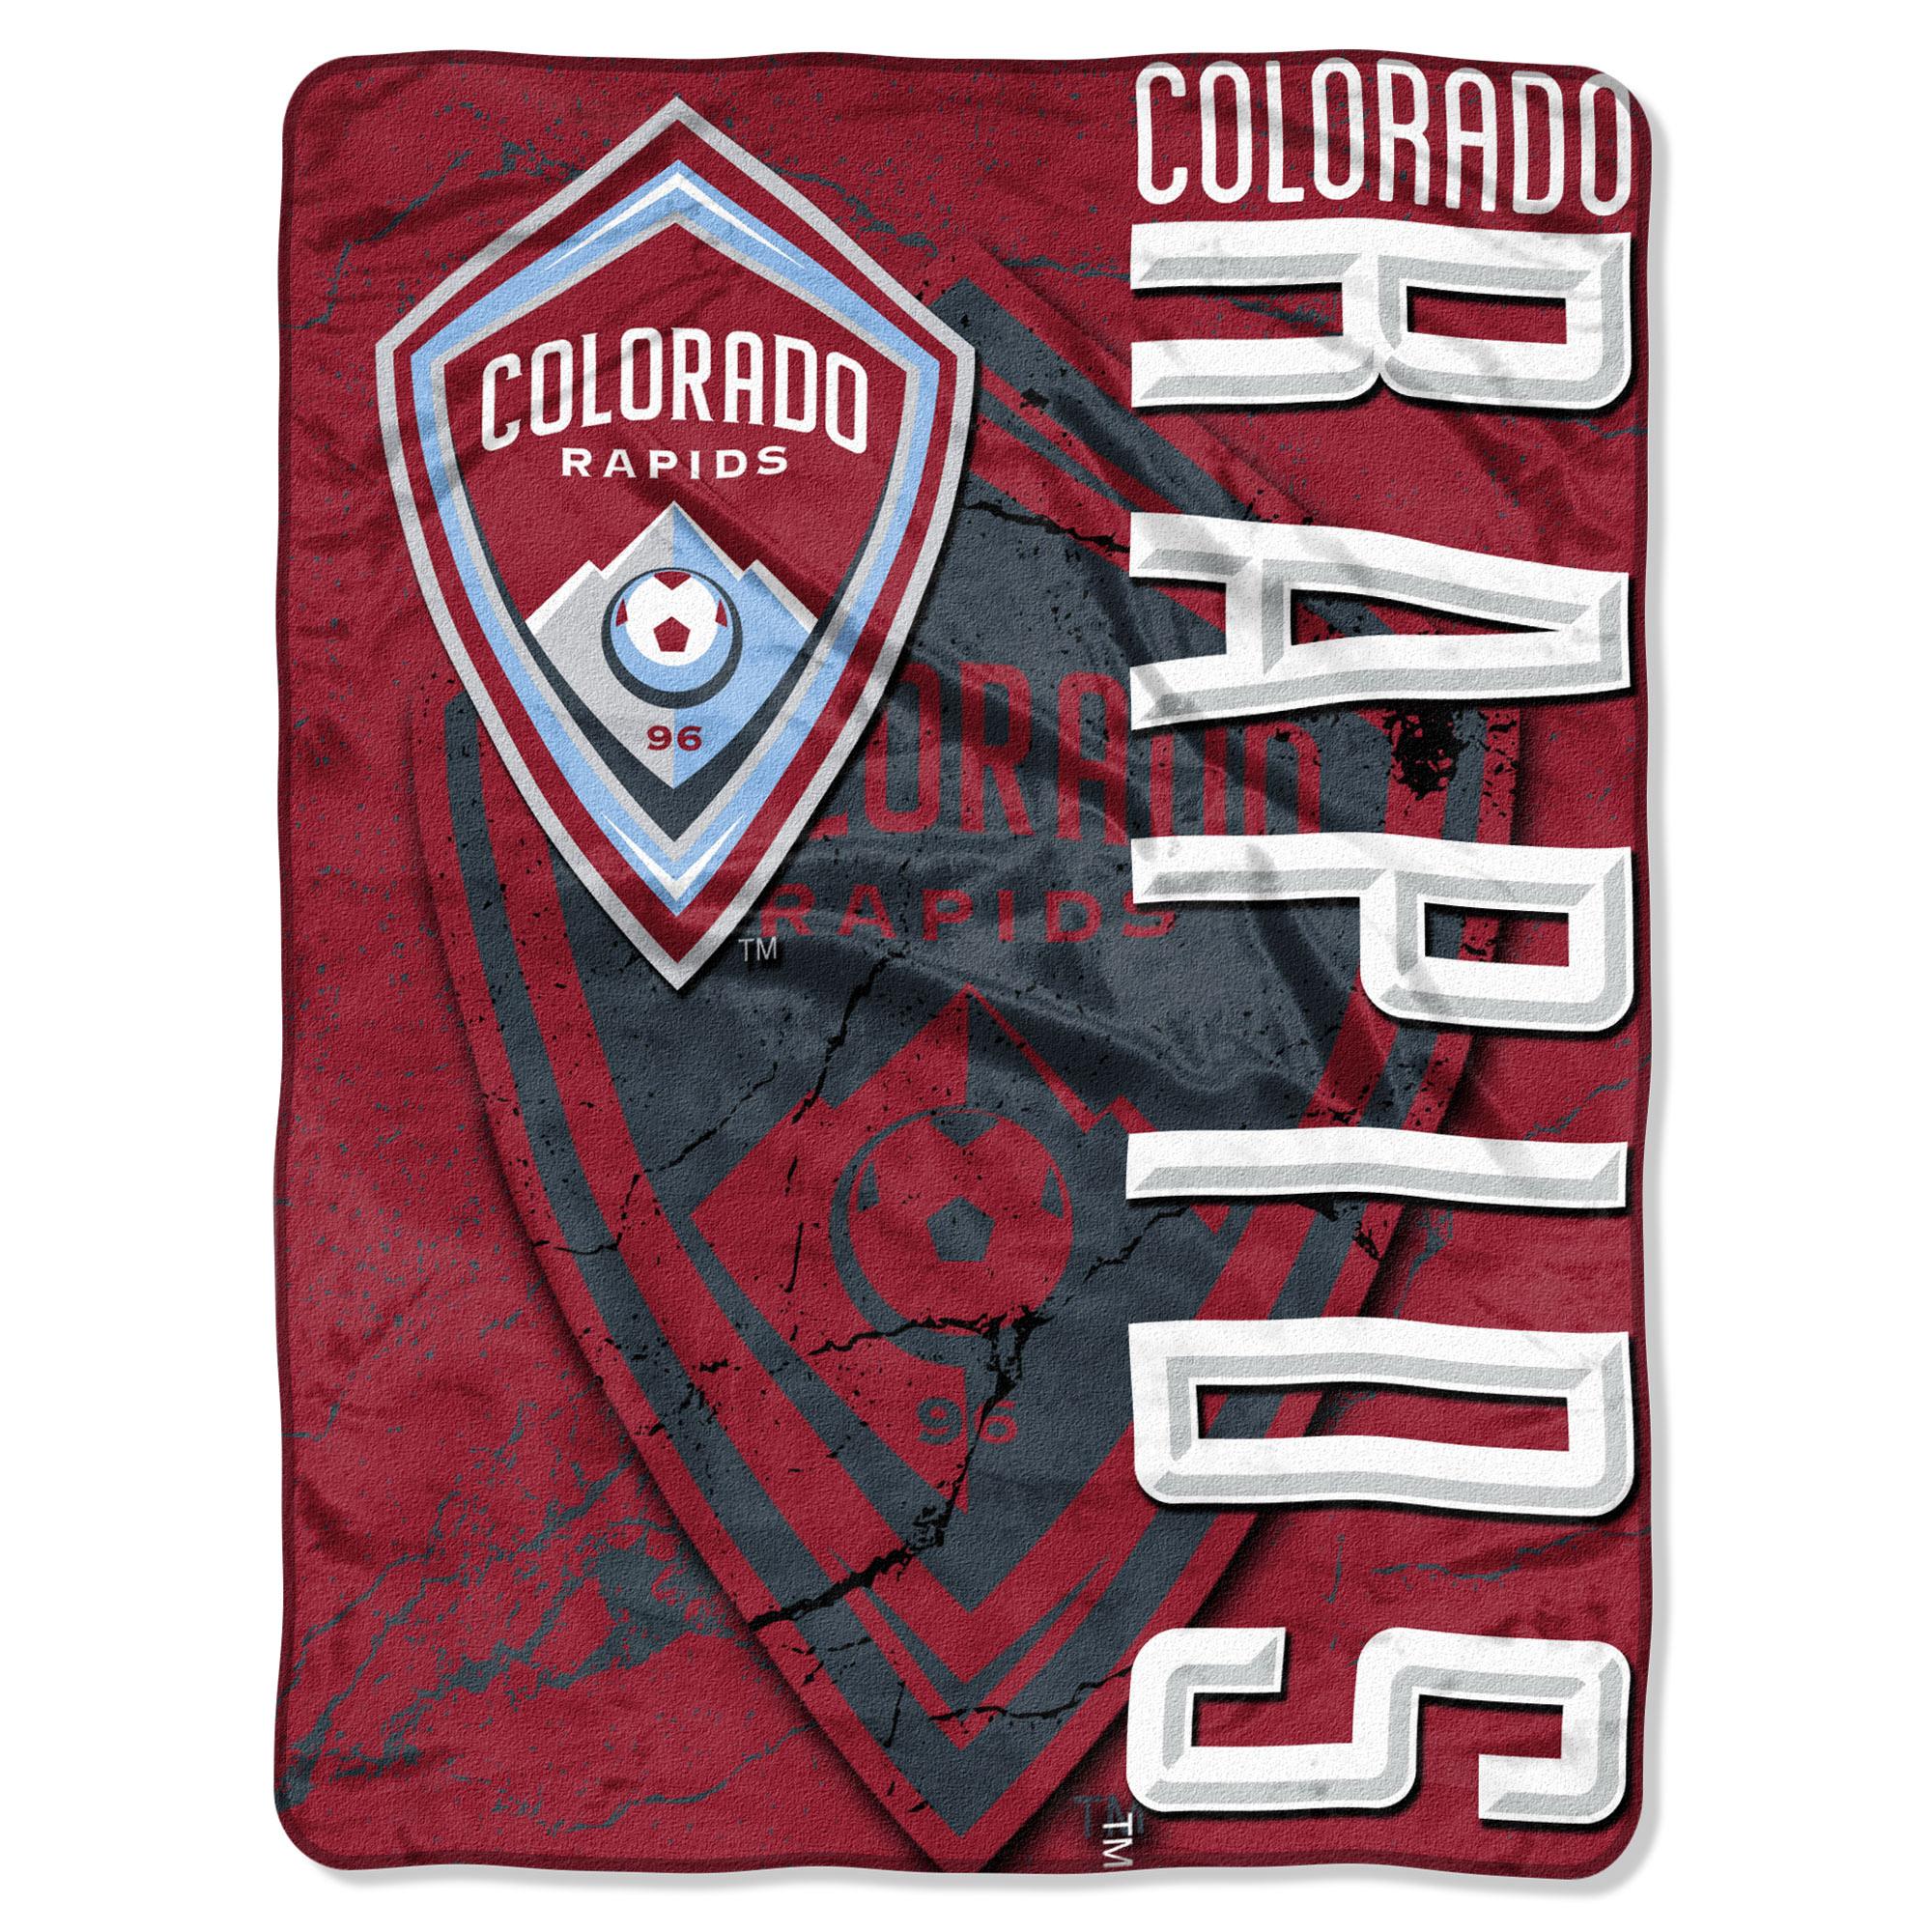 "Colorado Rapids The Northwest Company 46"" x 60"" Concrete Raschel Throw Blanket - No Size"